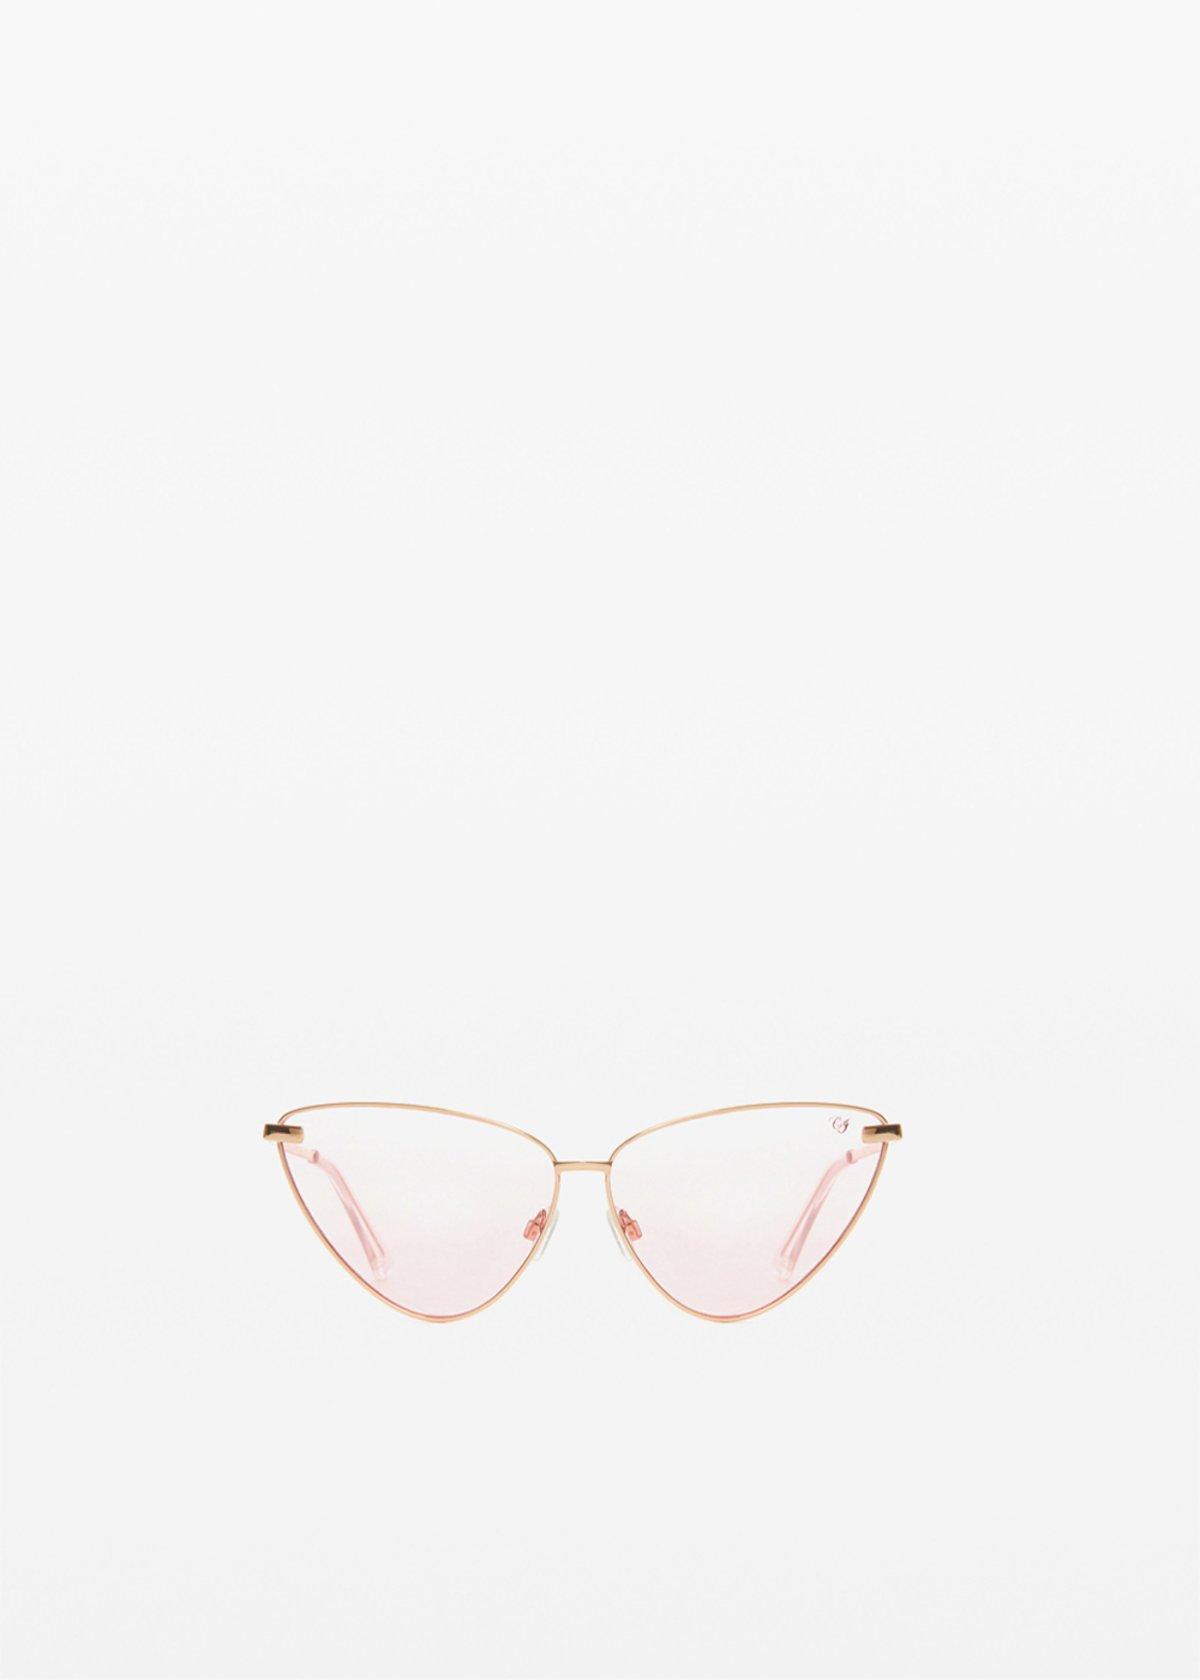 Cat-eye sunglasses SR 2183 - Bubble Metal - Woman - Category image